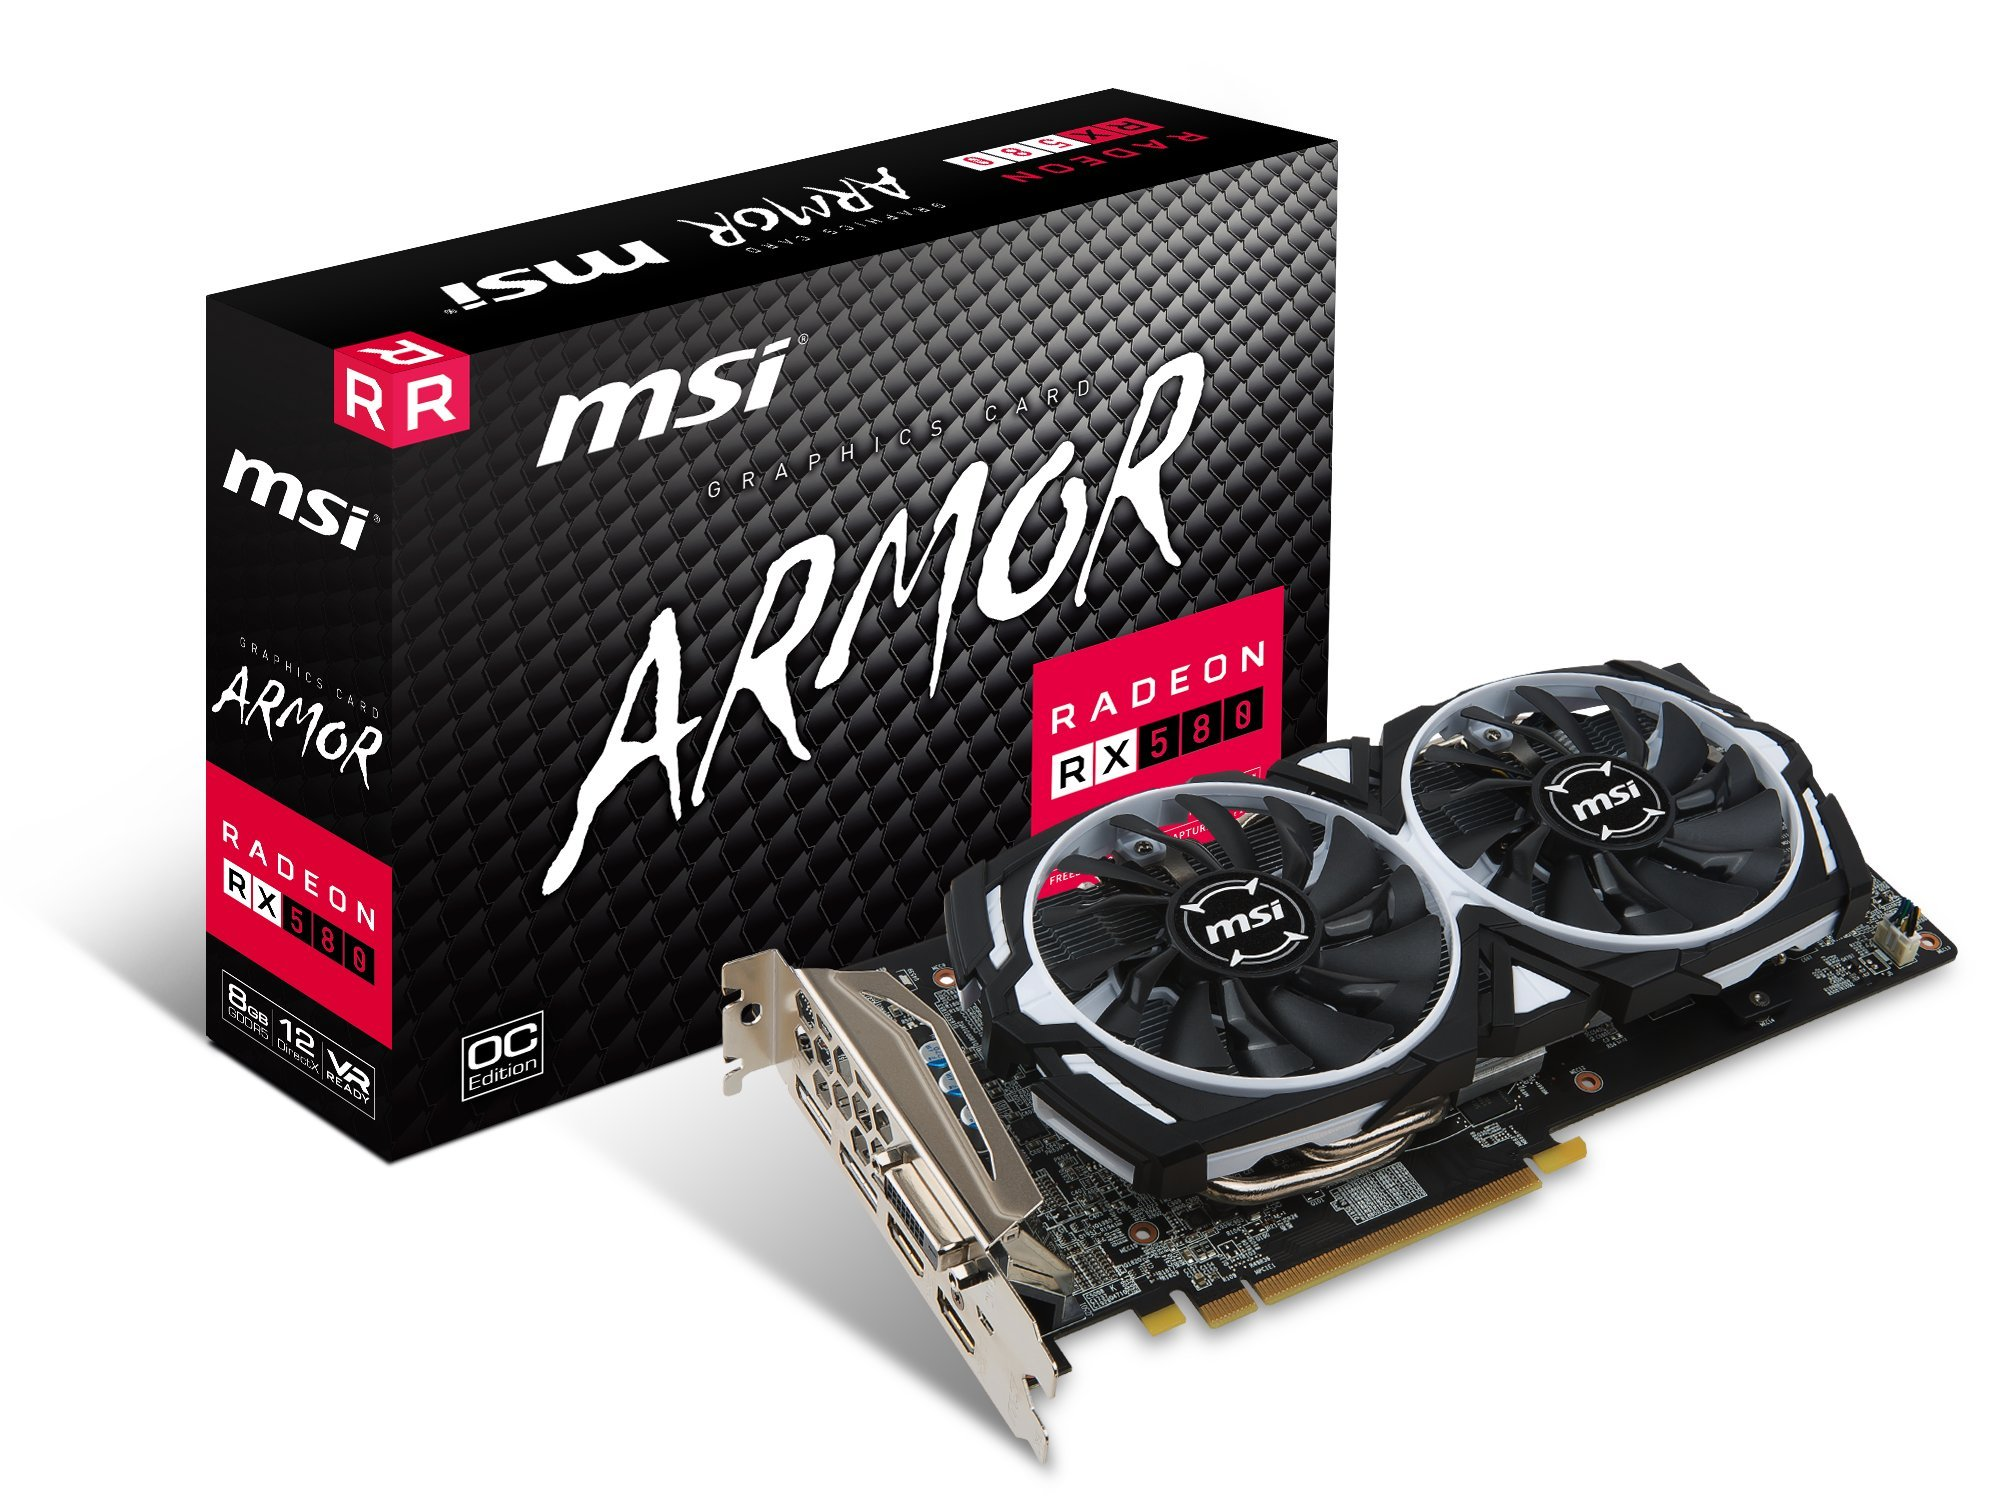 MSI VGA Graphic Cards RX 580 ARMOR 8G OC